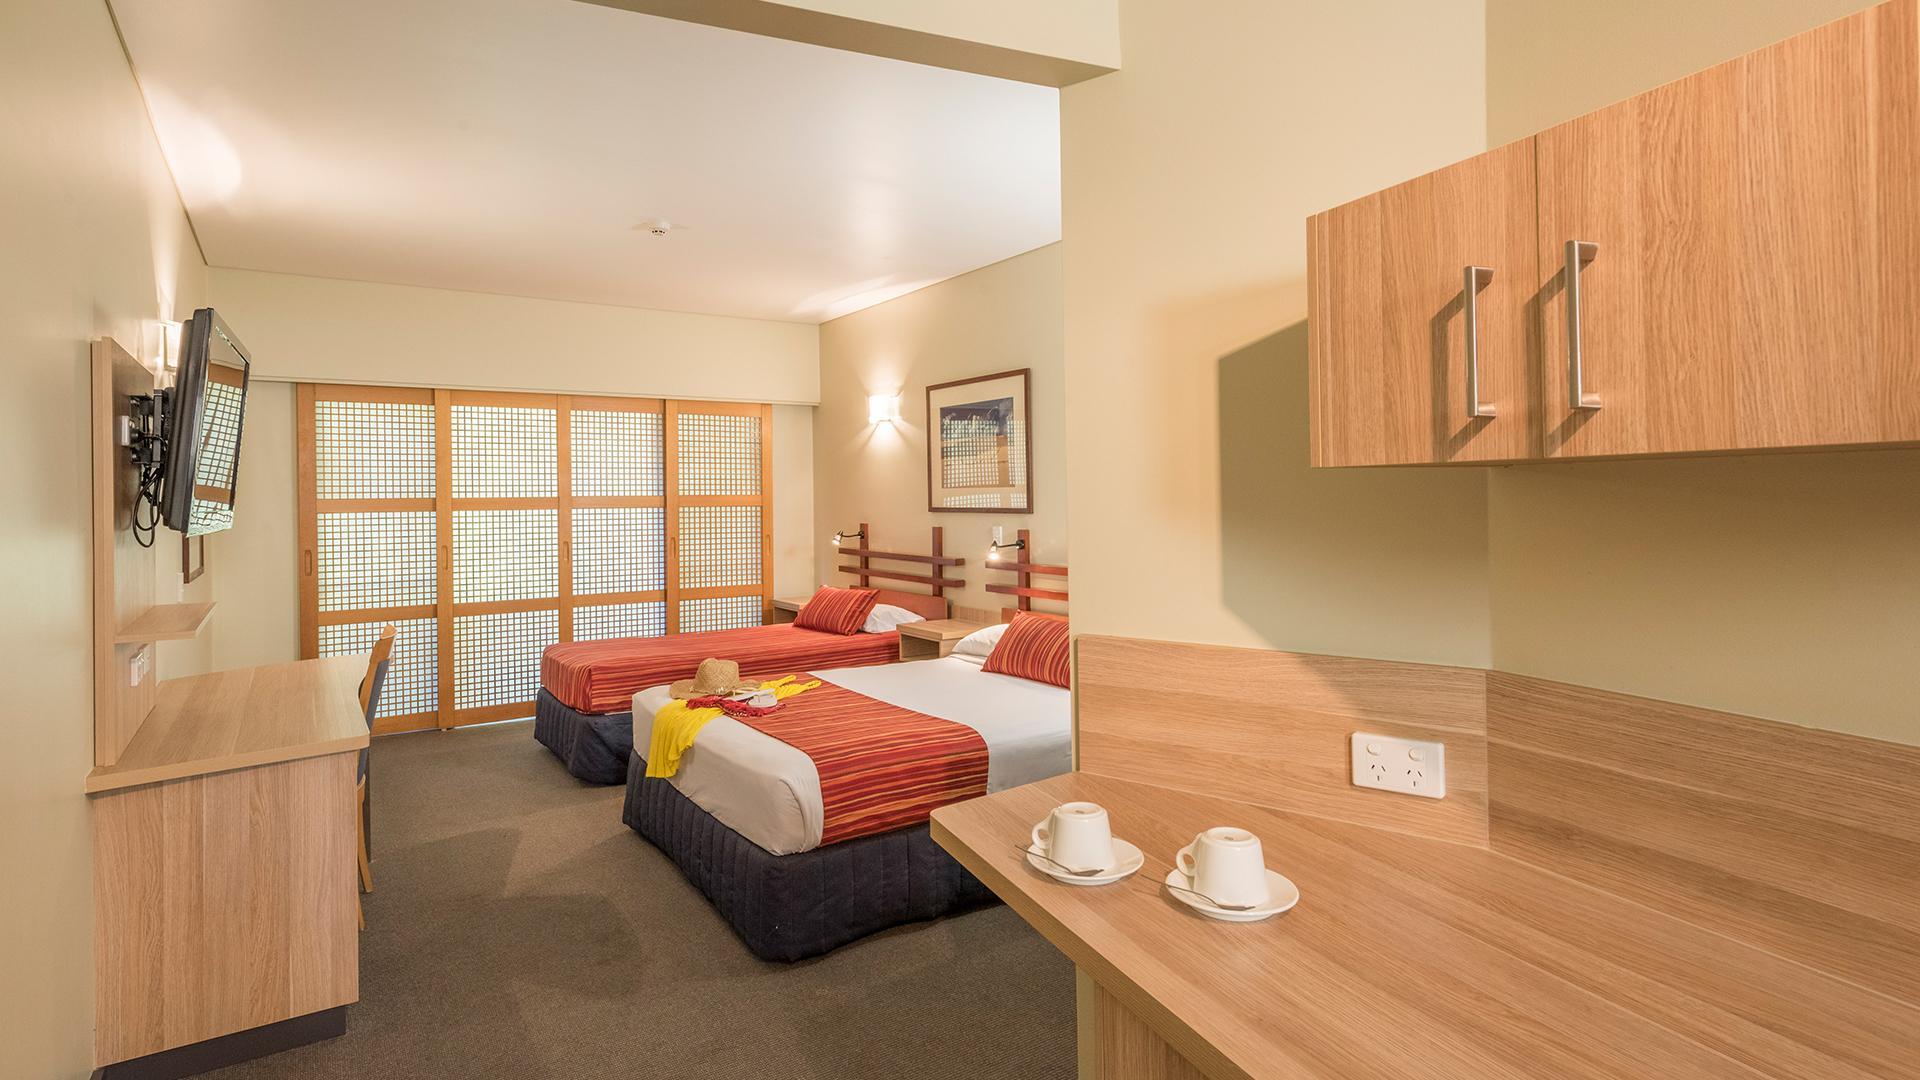 Resort Hotel Room - 3 Nights - ROMANCE image 1 at Kingfisher Bay Resort by Fraser Coast Regional, Queensland, Australia